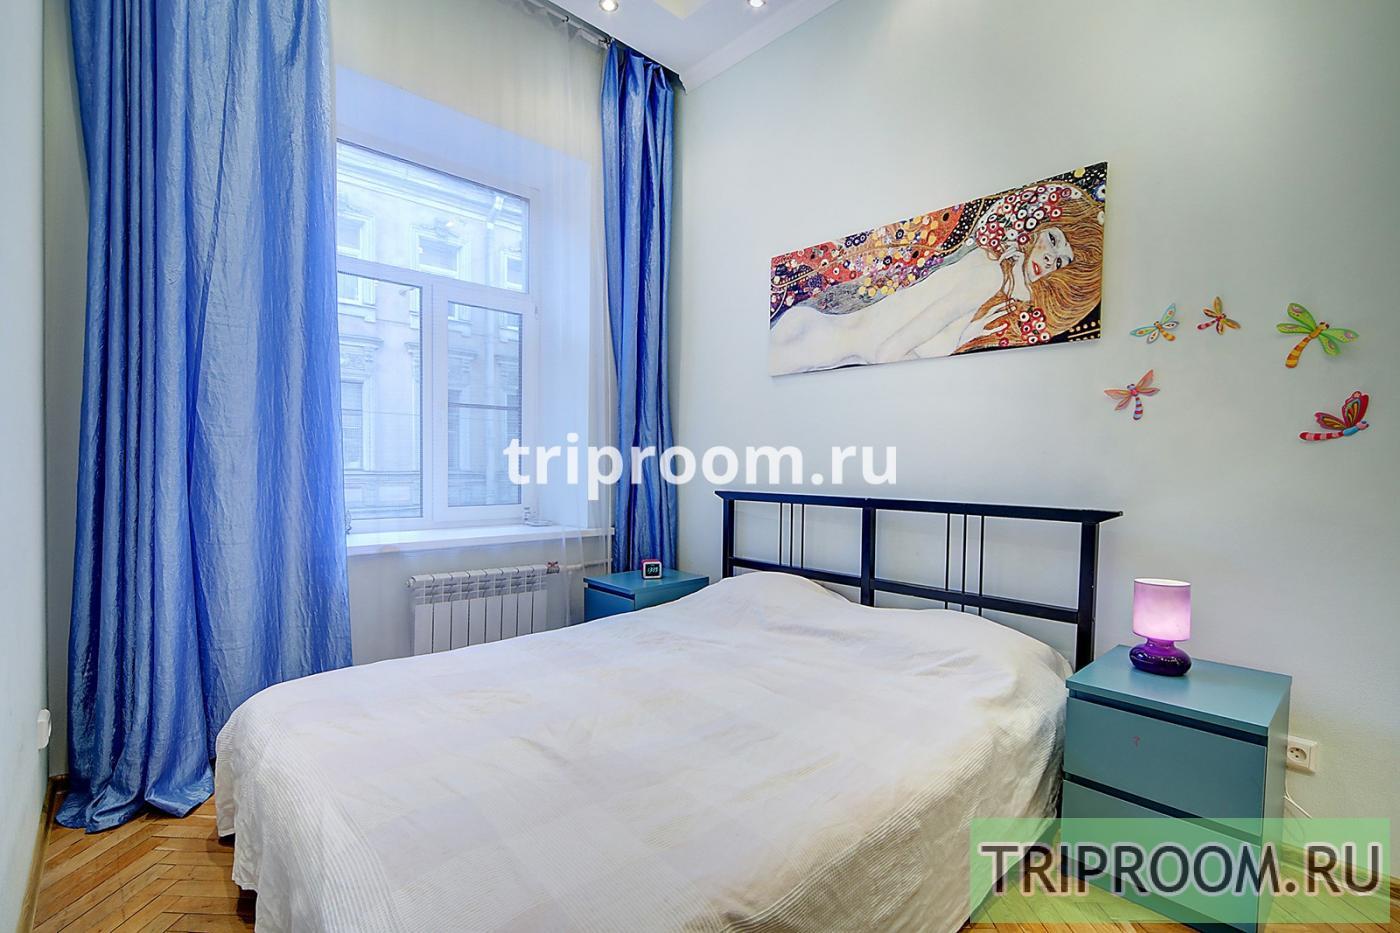 2-комнатная квартира посуточно (вариант № 15426), ул. Лиговский проспект, фото № 15